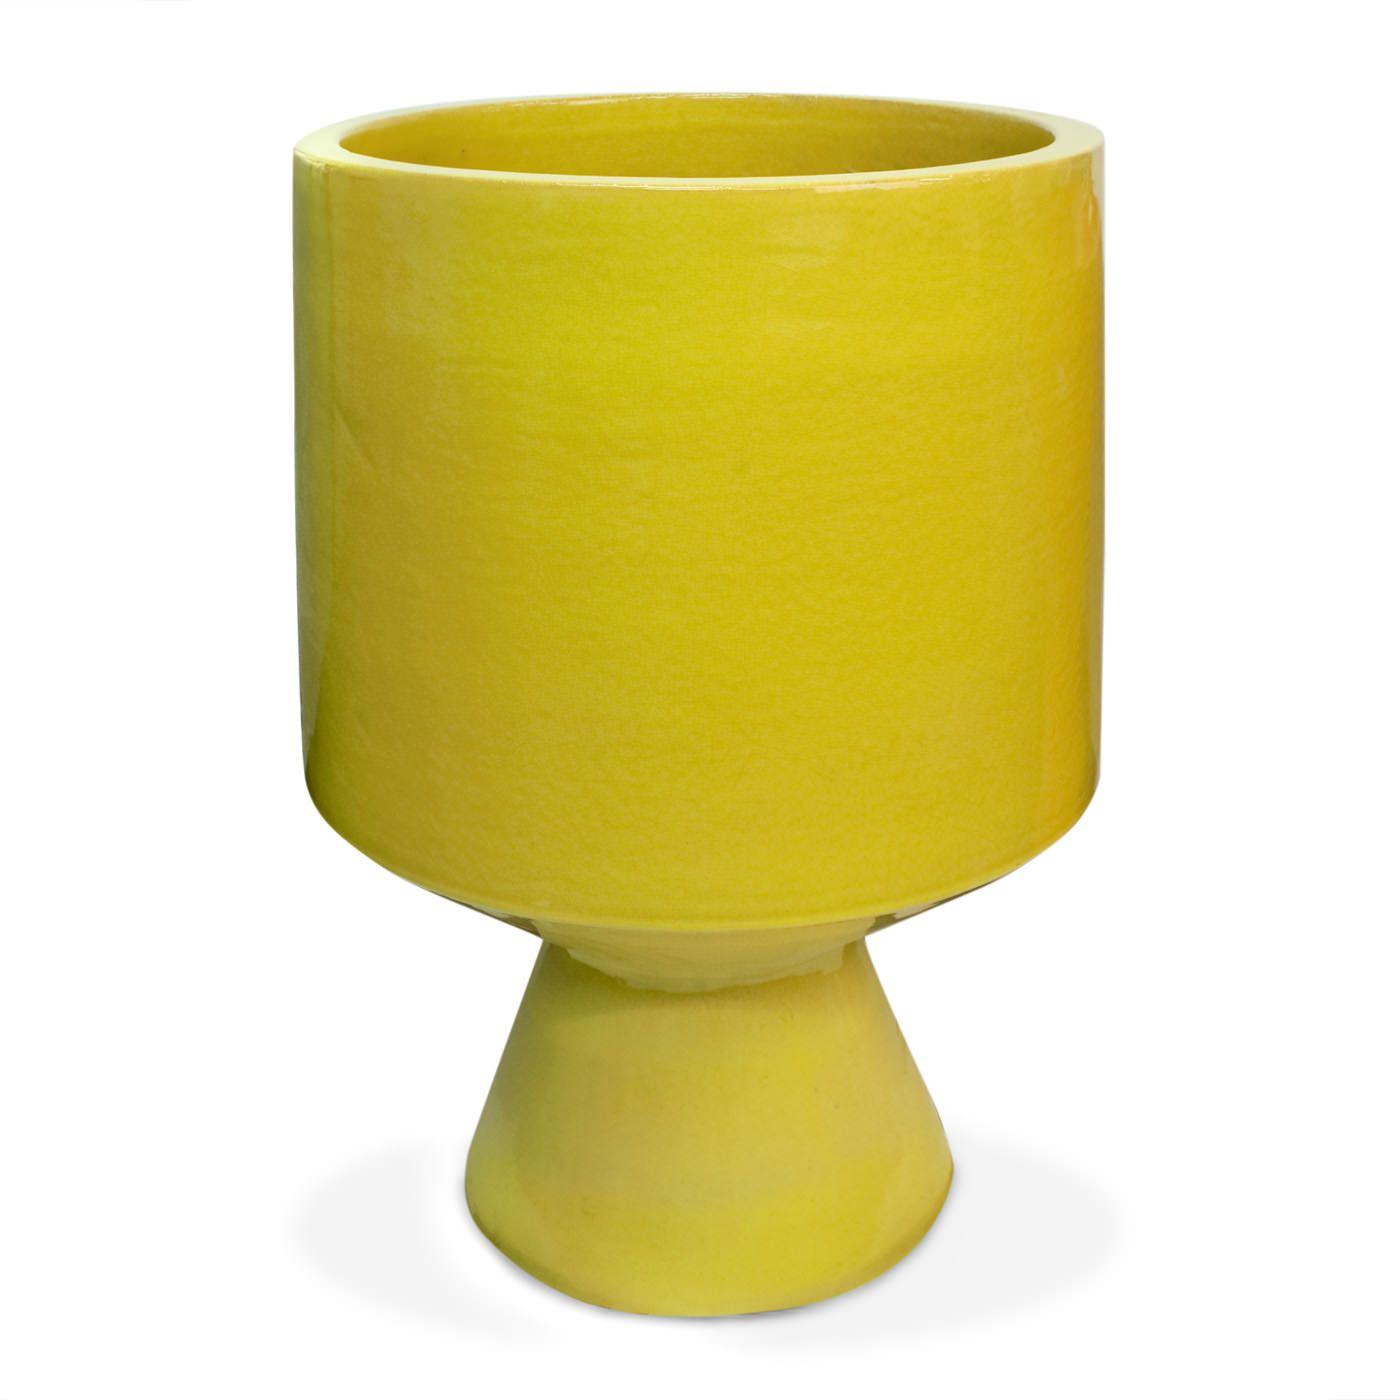 Yellow Okura Planter Ceramic Pot Stoneware Planter Decorative Bird Houses